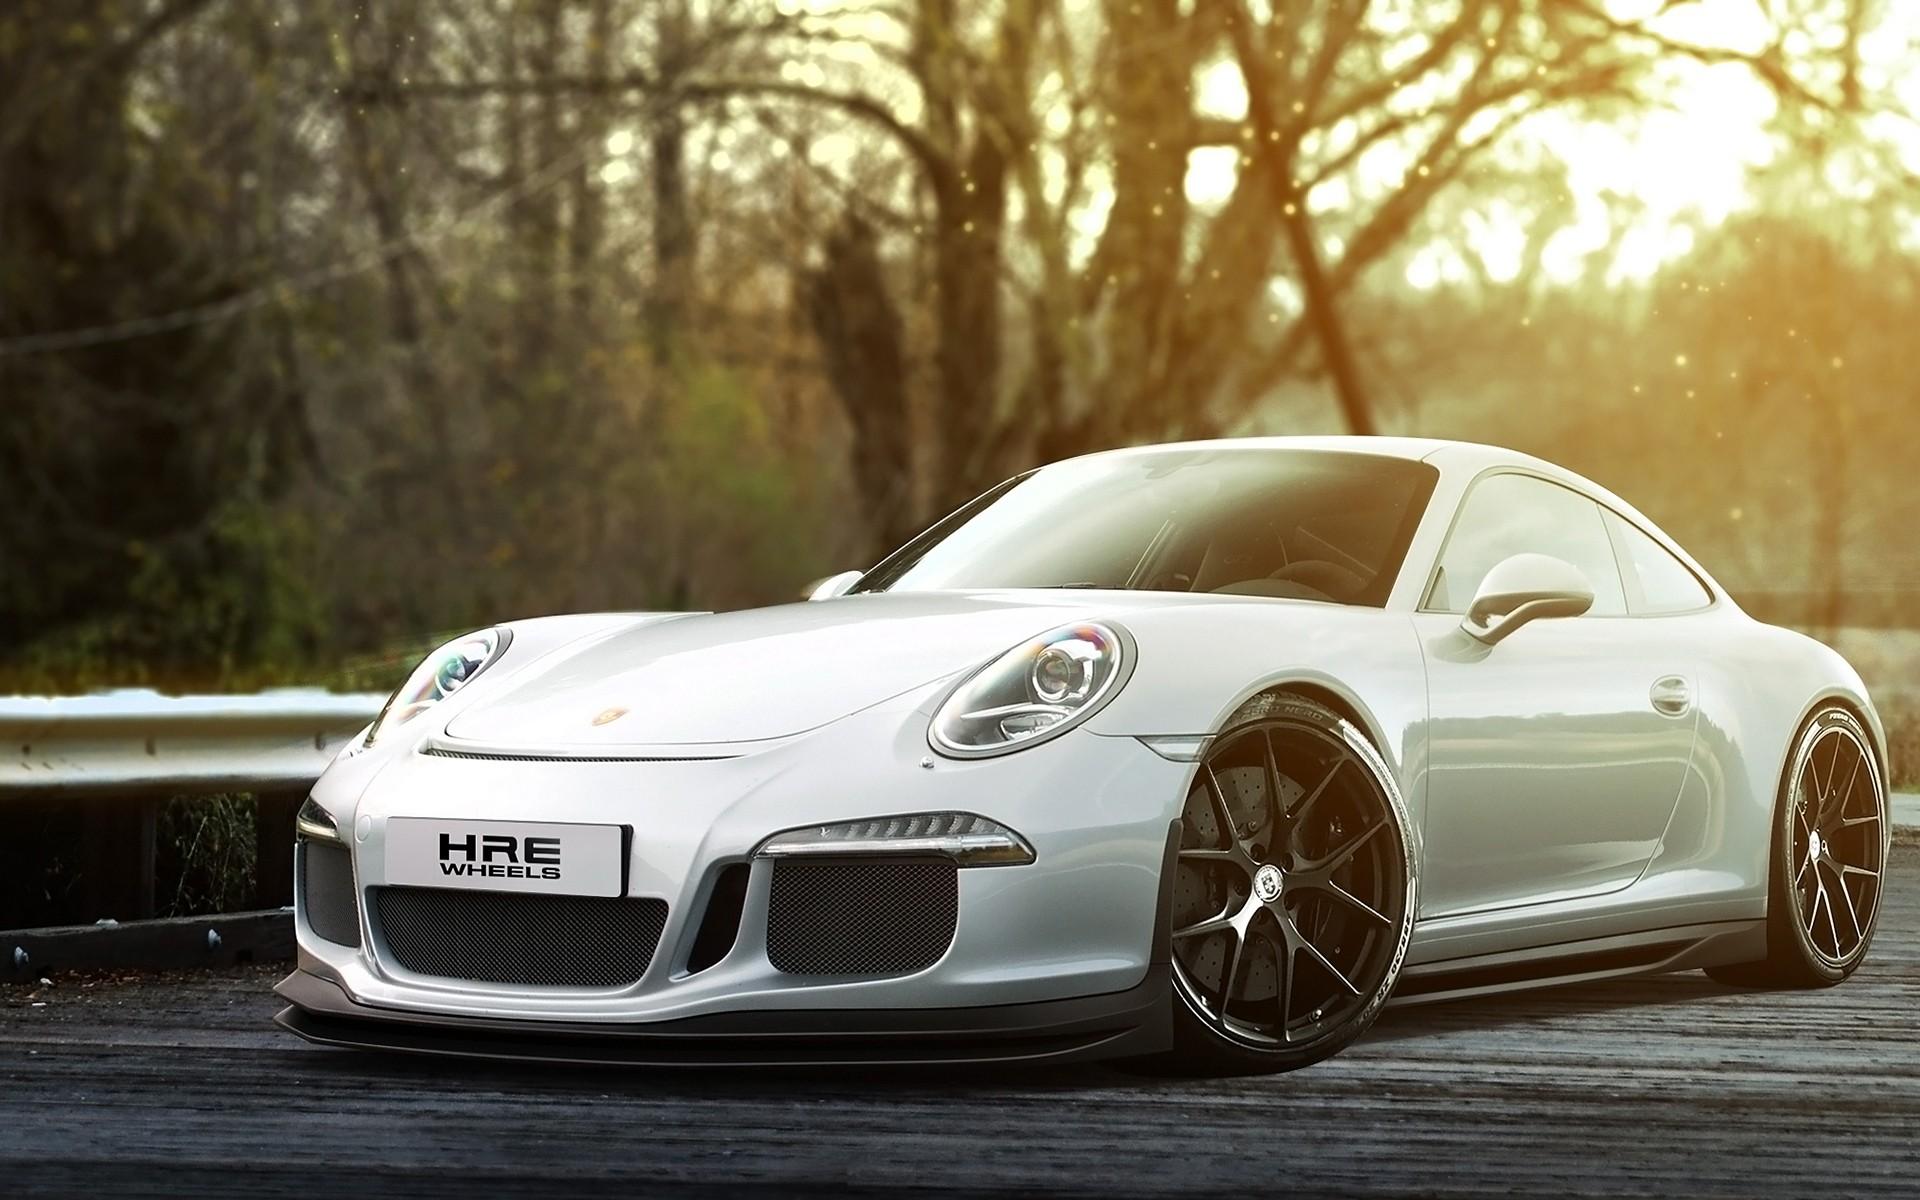 Wallpaper Sports Car White Cars Coupe Convertible Porsche 911